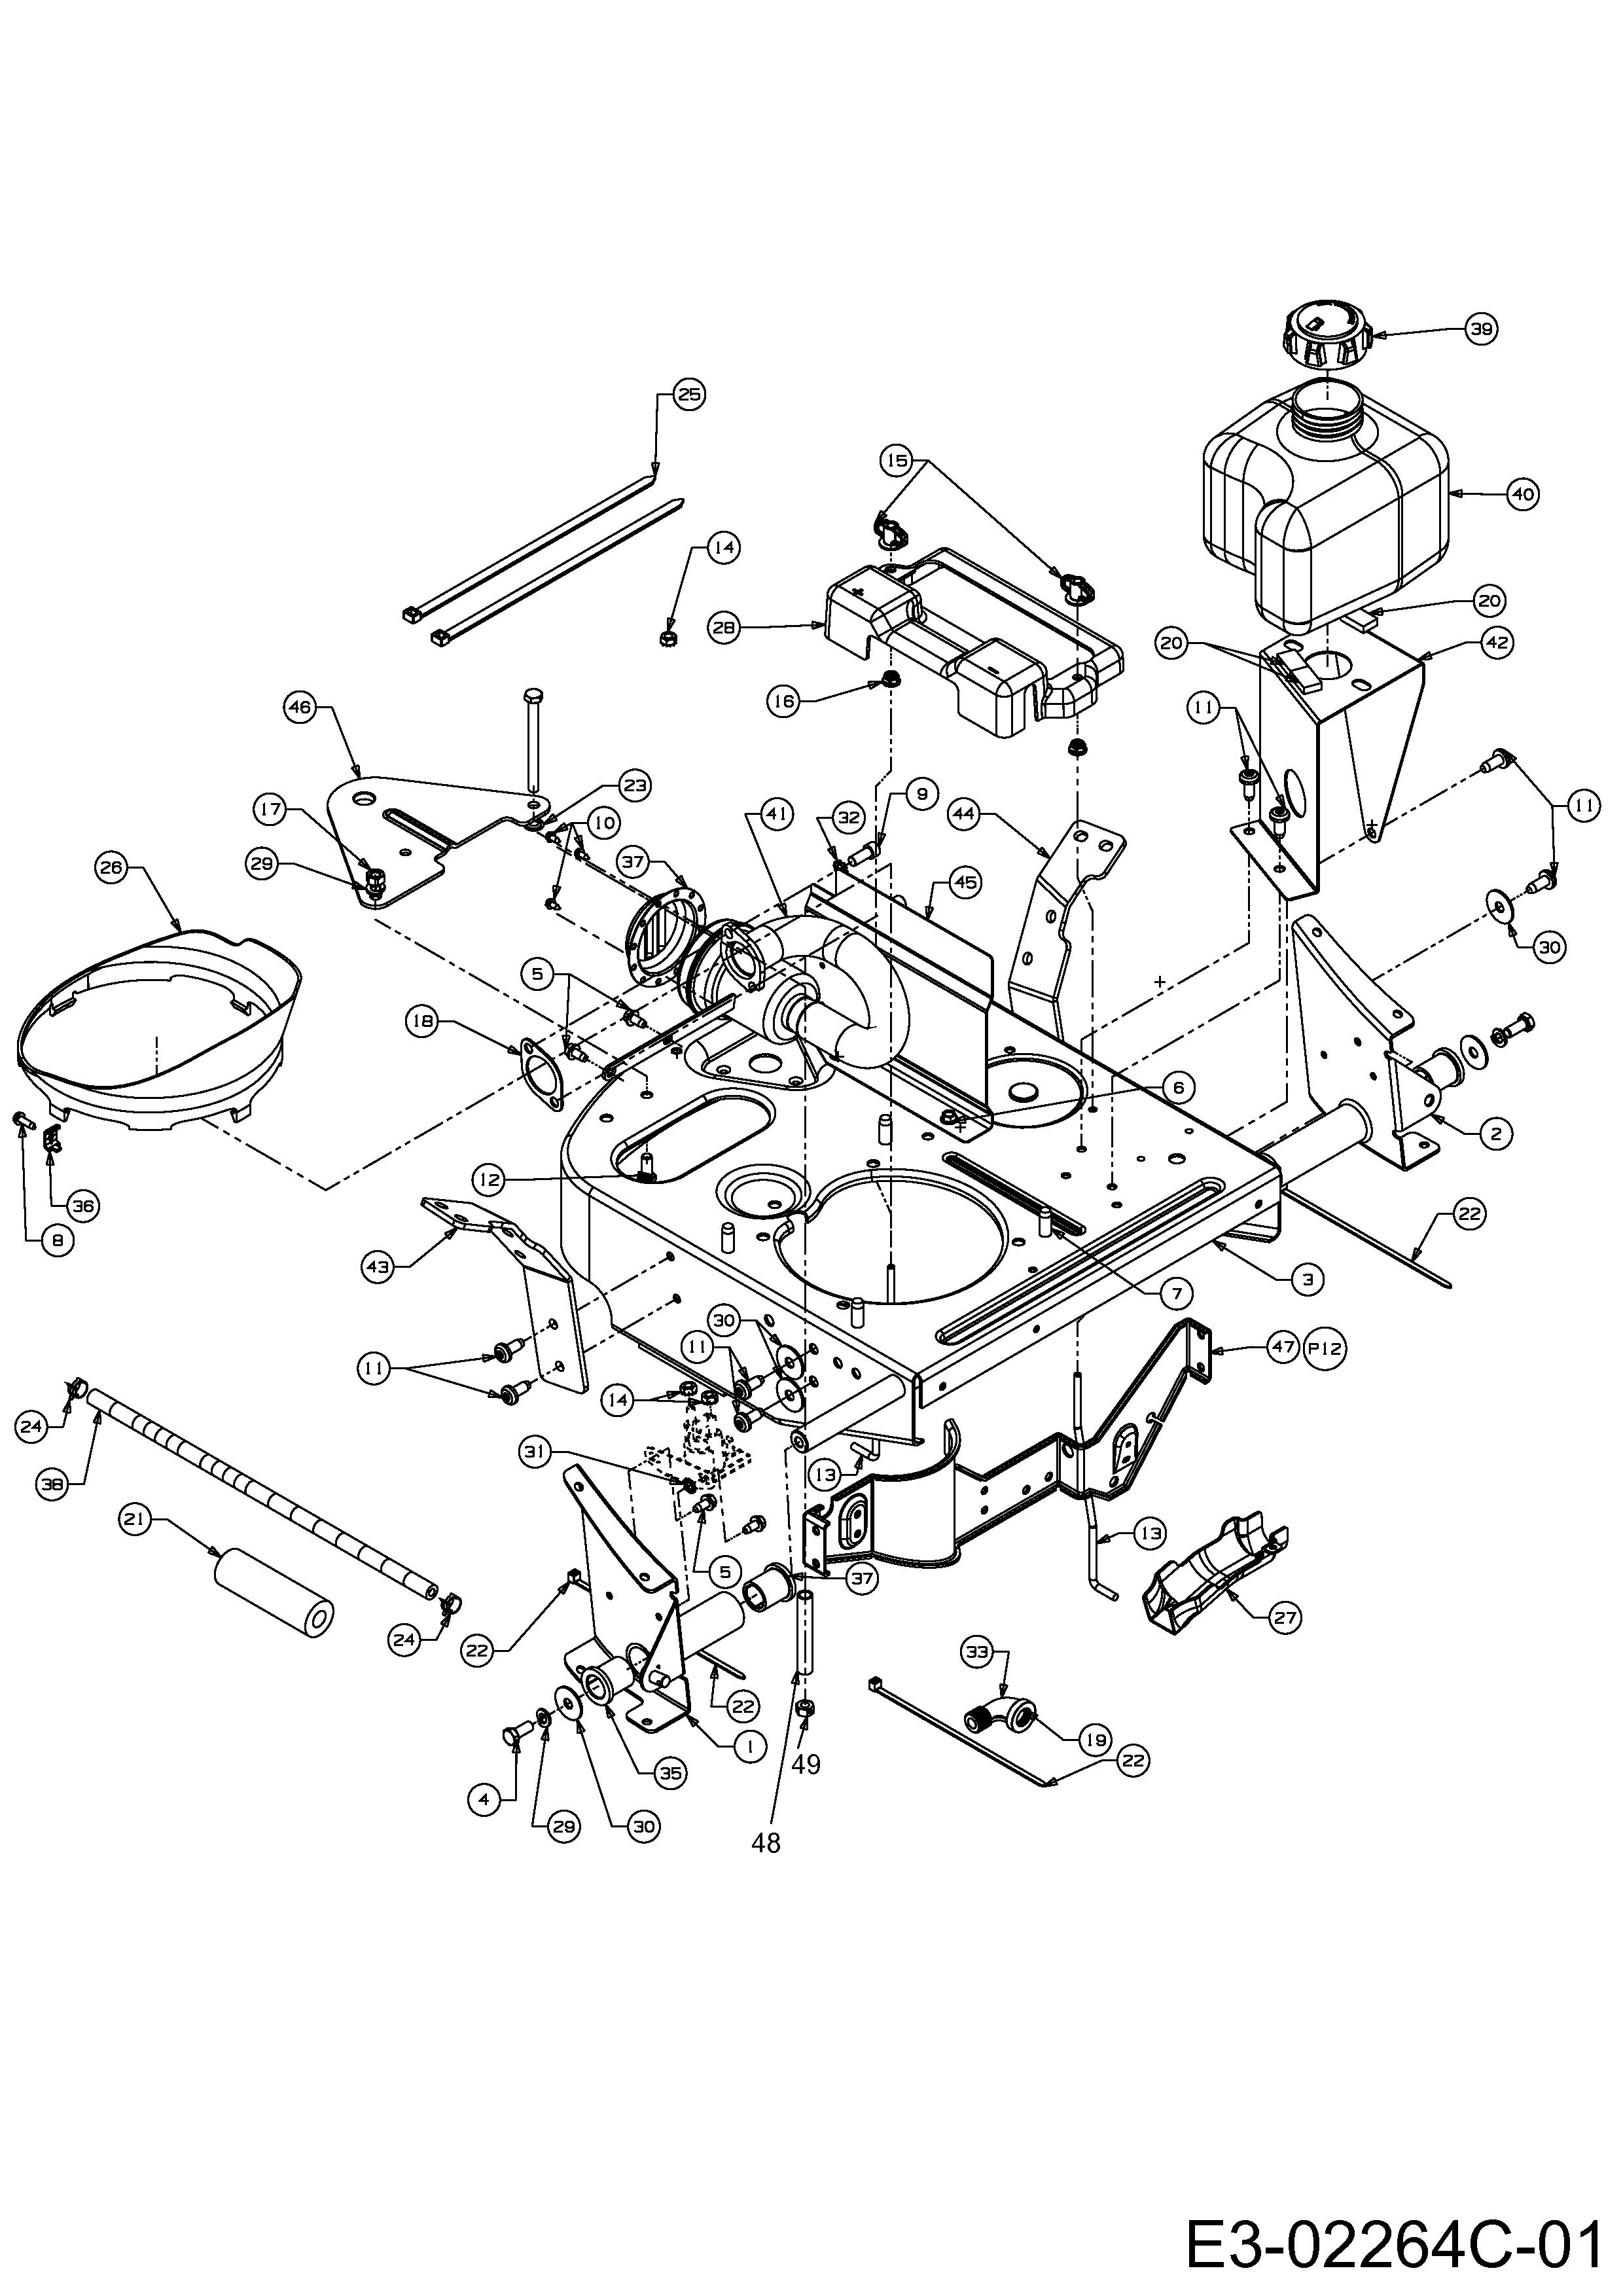 Anhangekupplung Rahmen Tank 13b 334 690 2012 Sc Edition Rasentraktoren Gutbrod